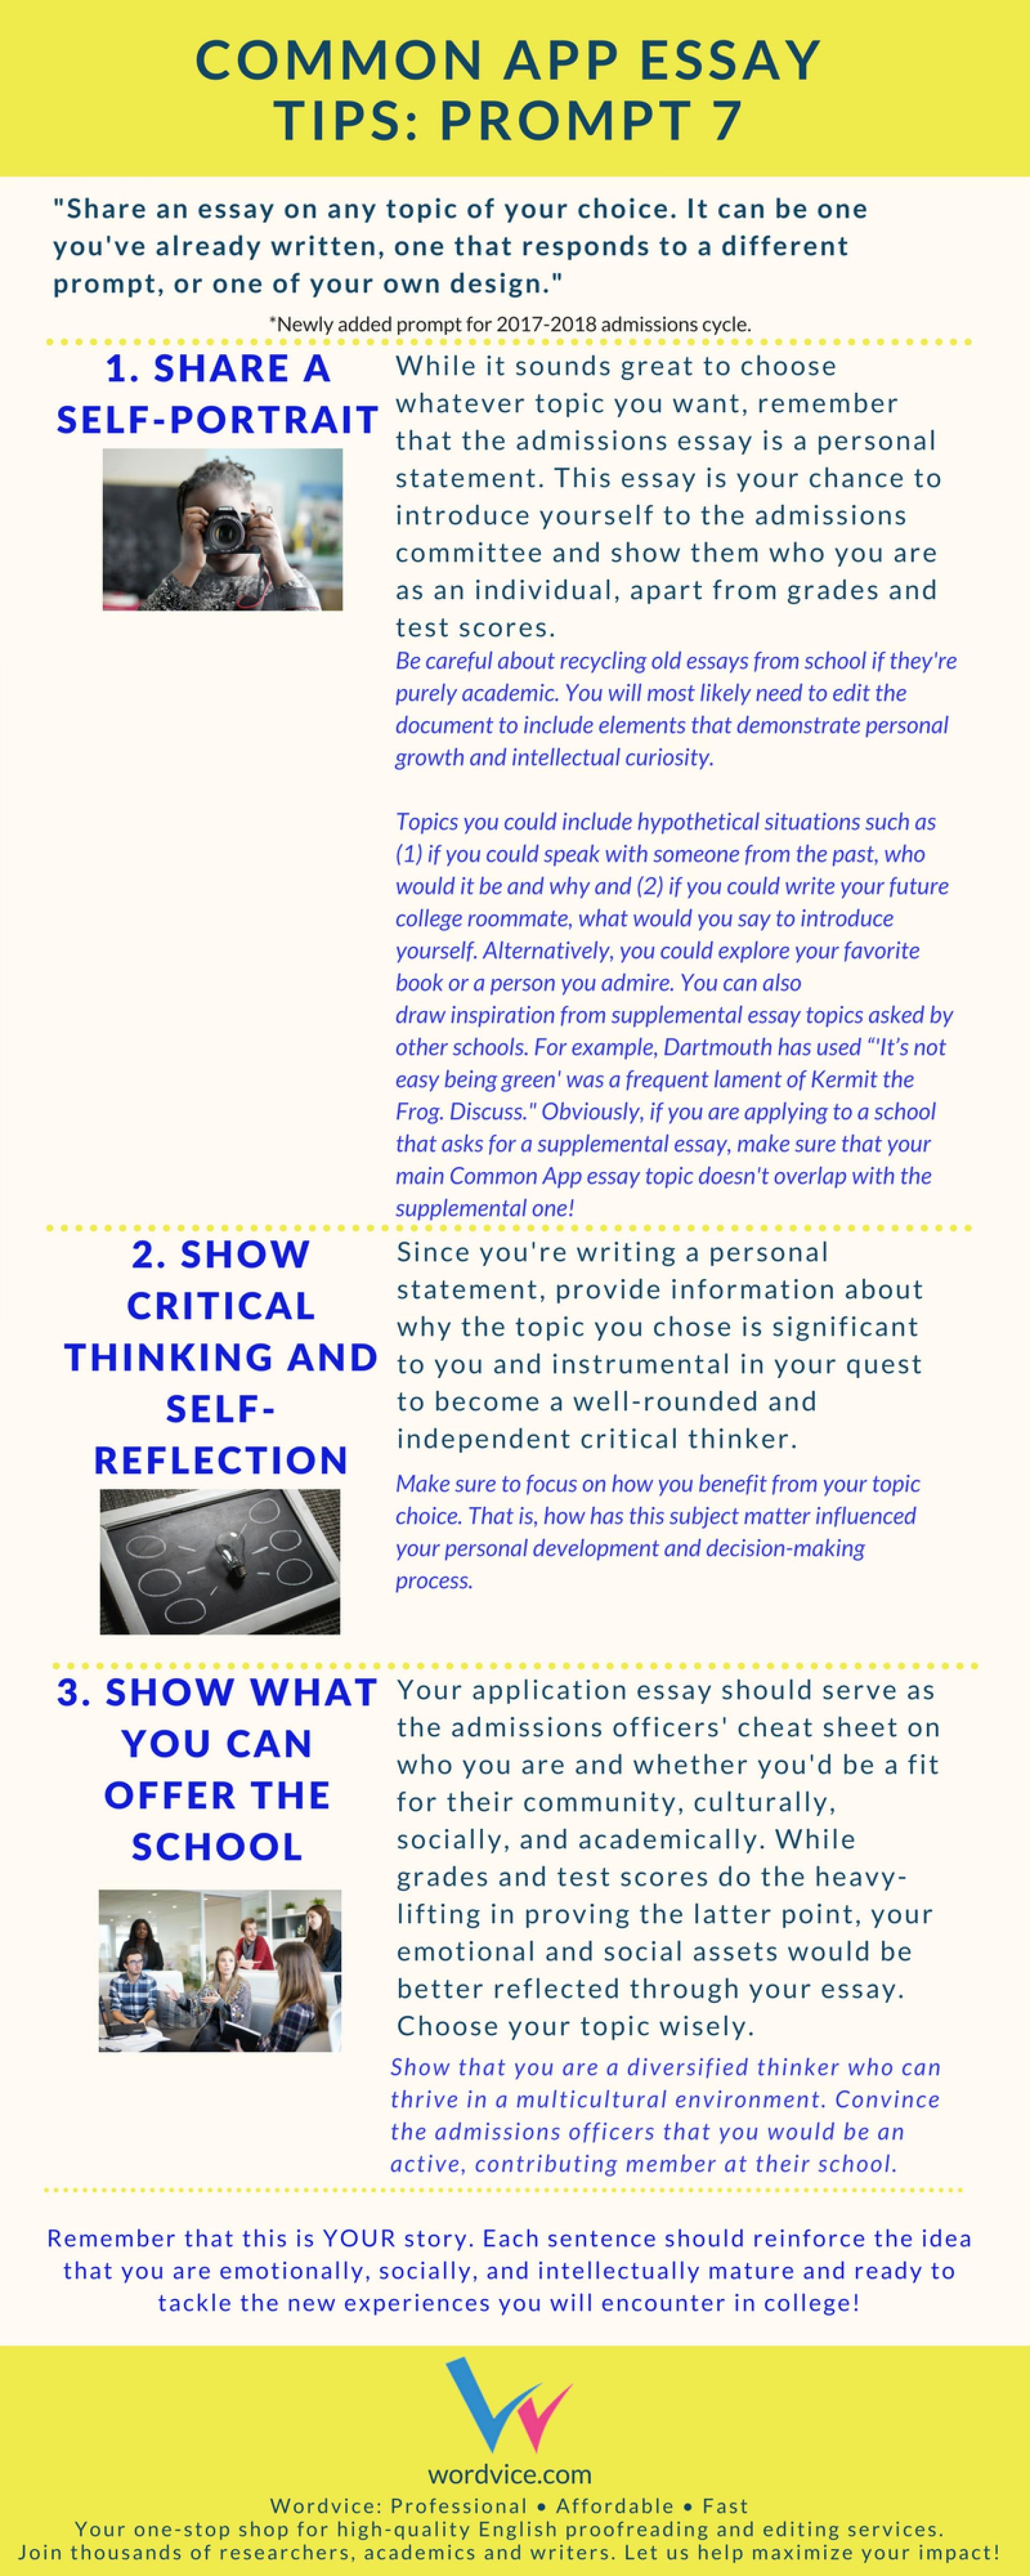 021 Essay Example Common App Brainstormprompt College Topics Frightening 2017 Boston Prompts Harvard Ideas 1920